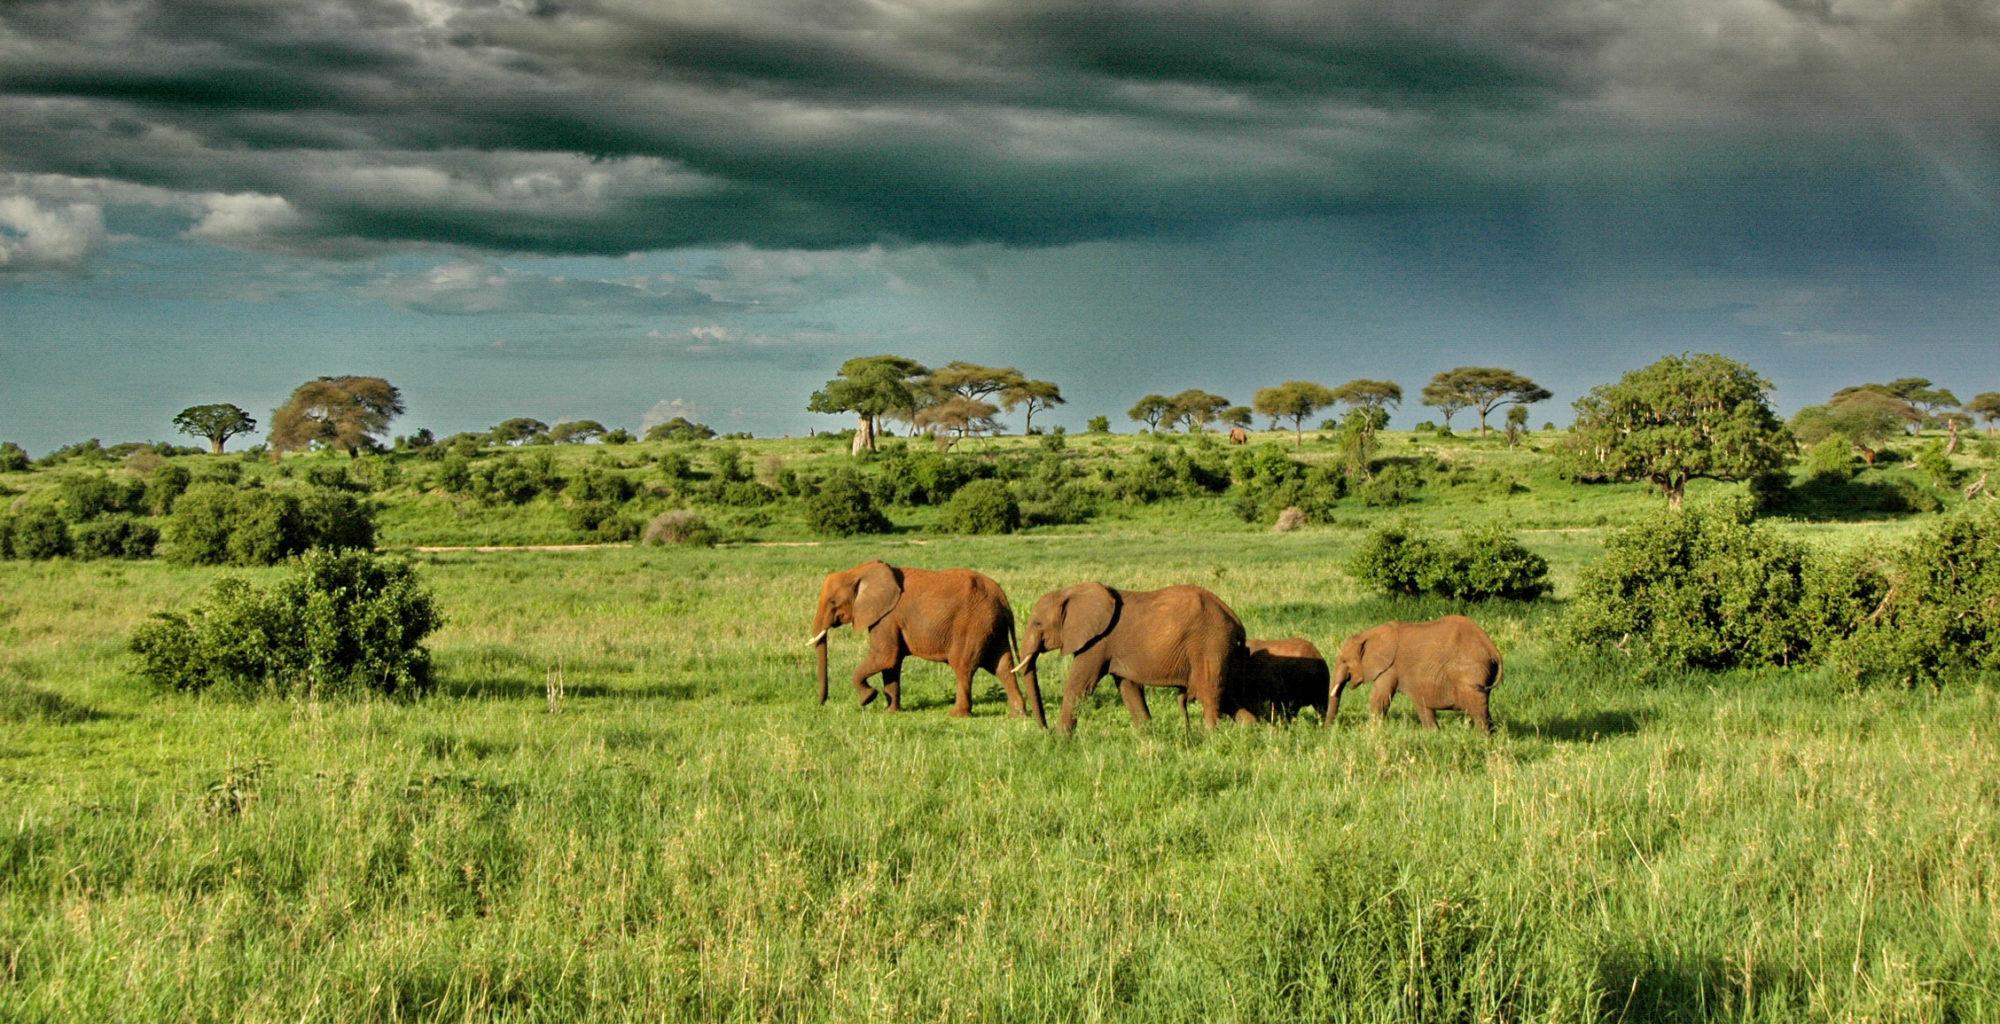 Elephants at Tarangire National Park